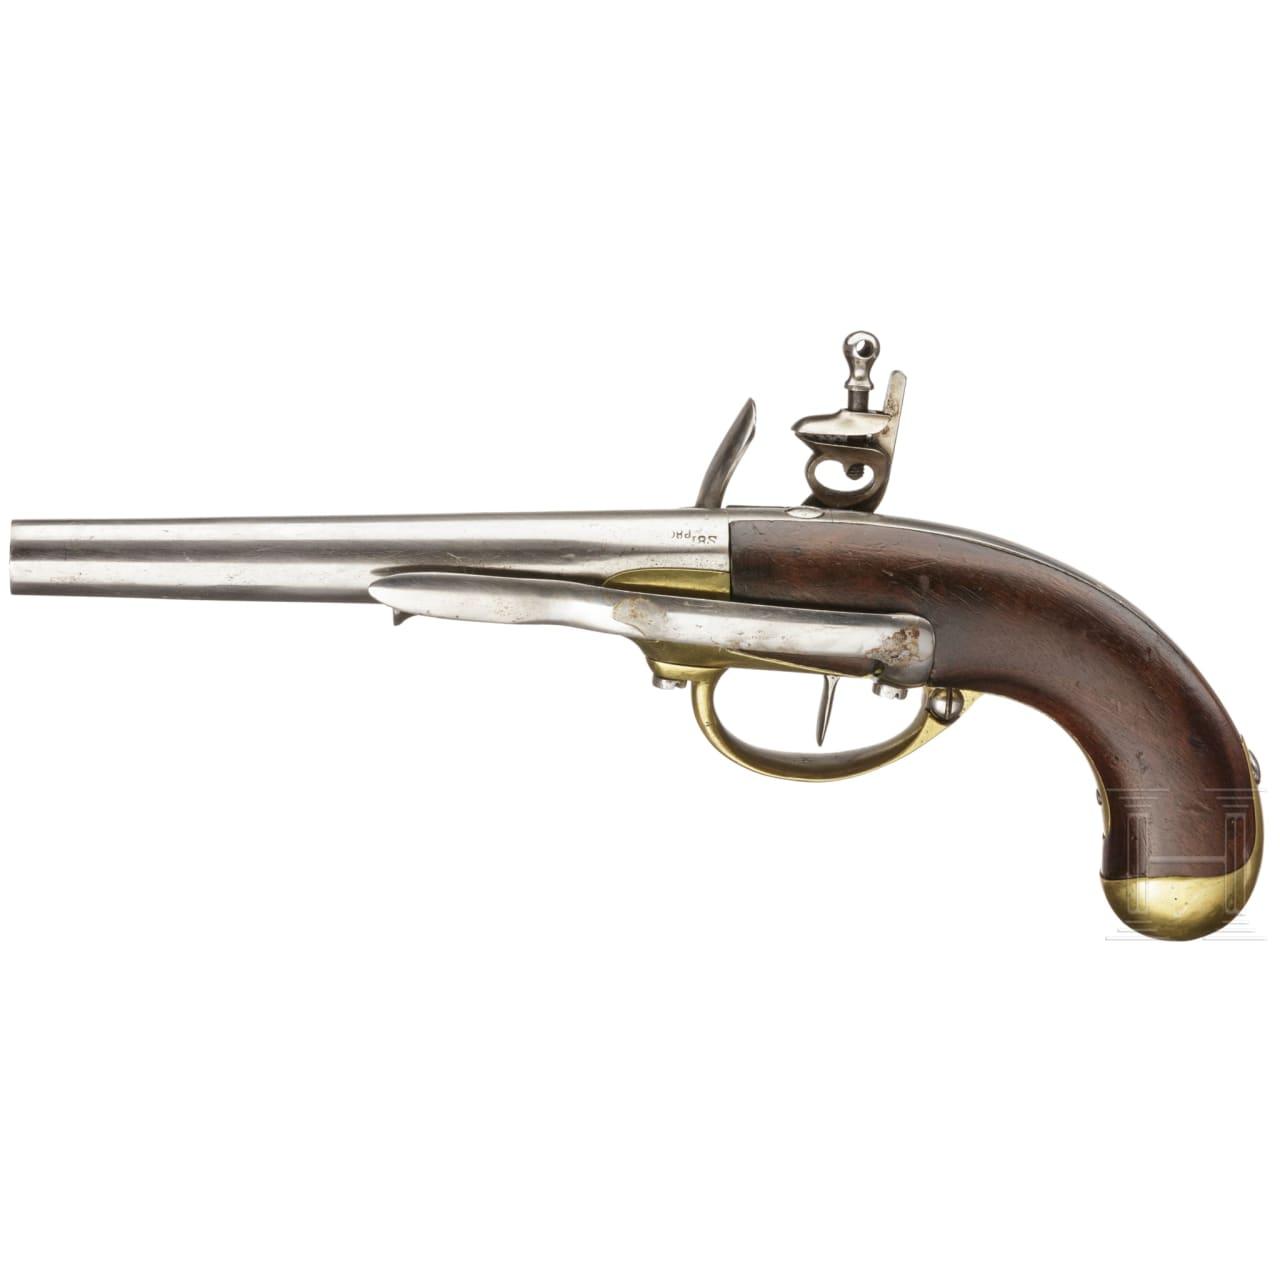 A French flintlock cavalry pistol Mod. 1777 1st pattern, St. Etienne, circa 1780